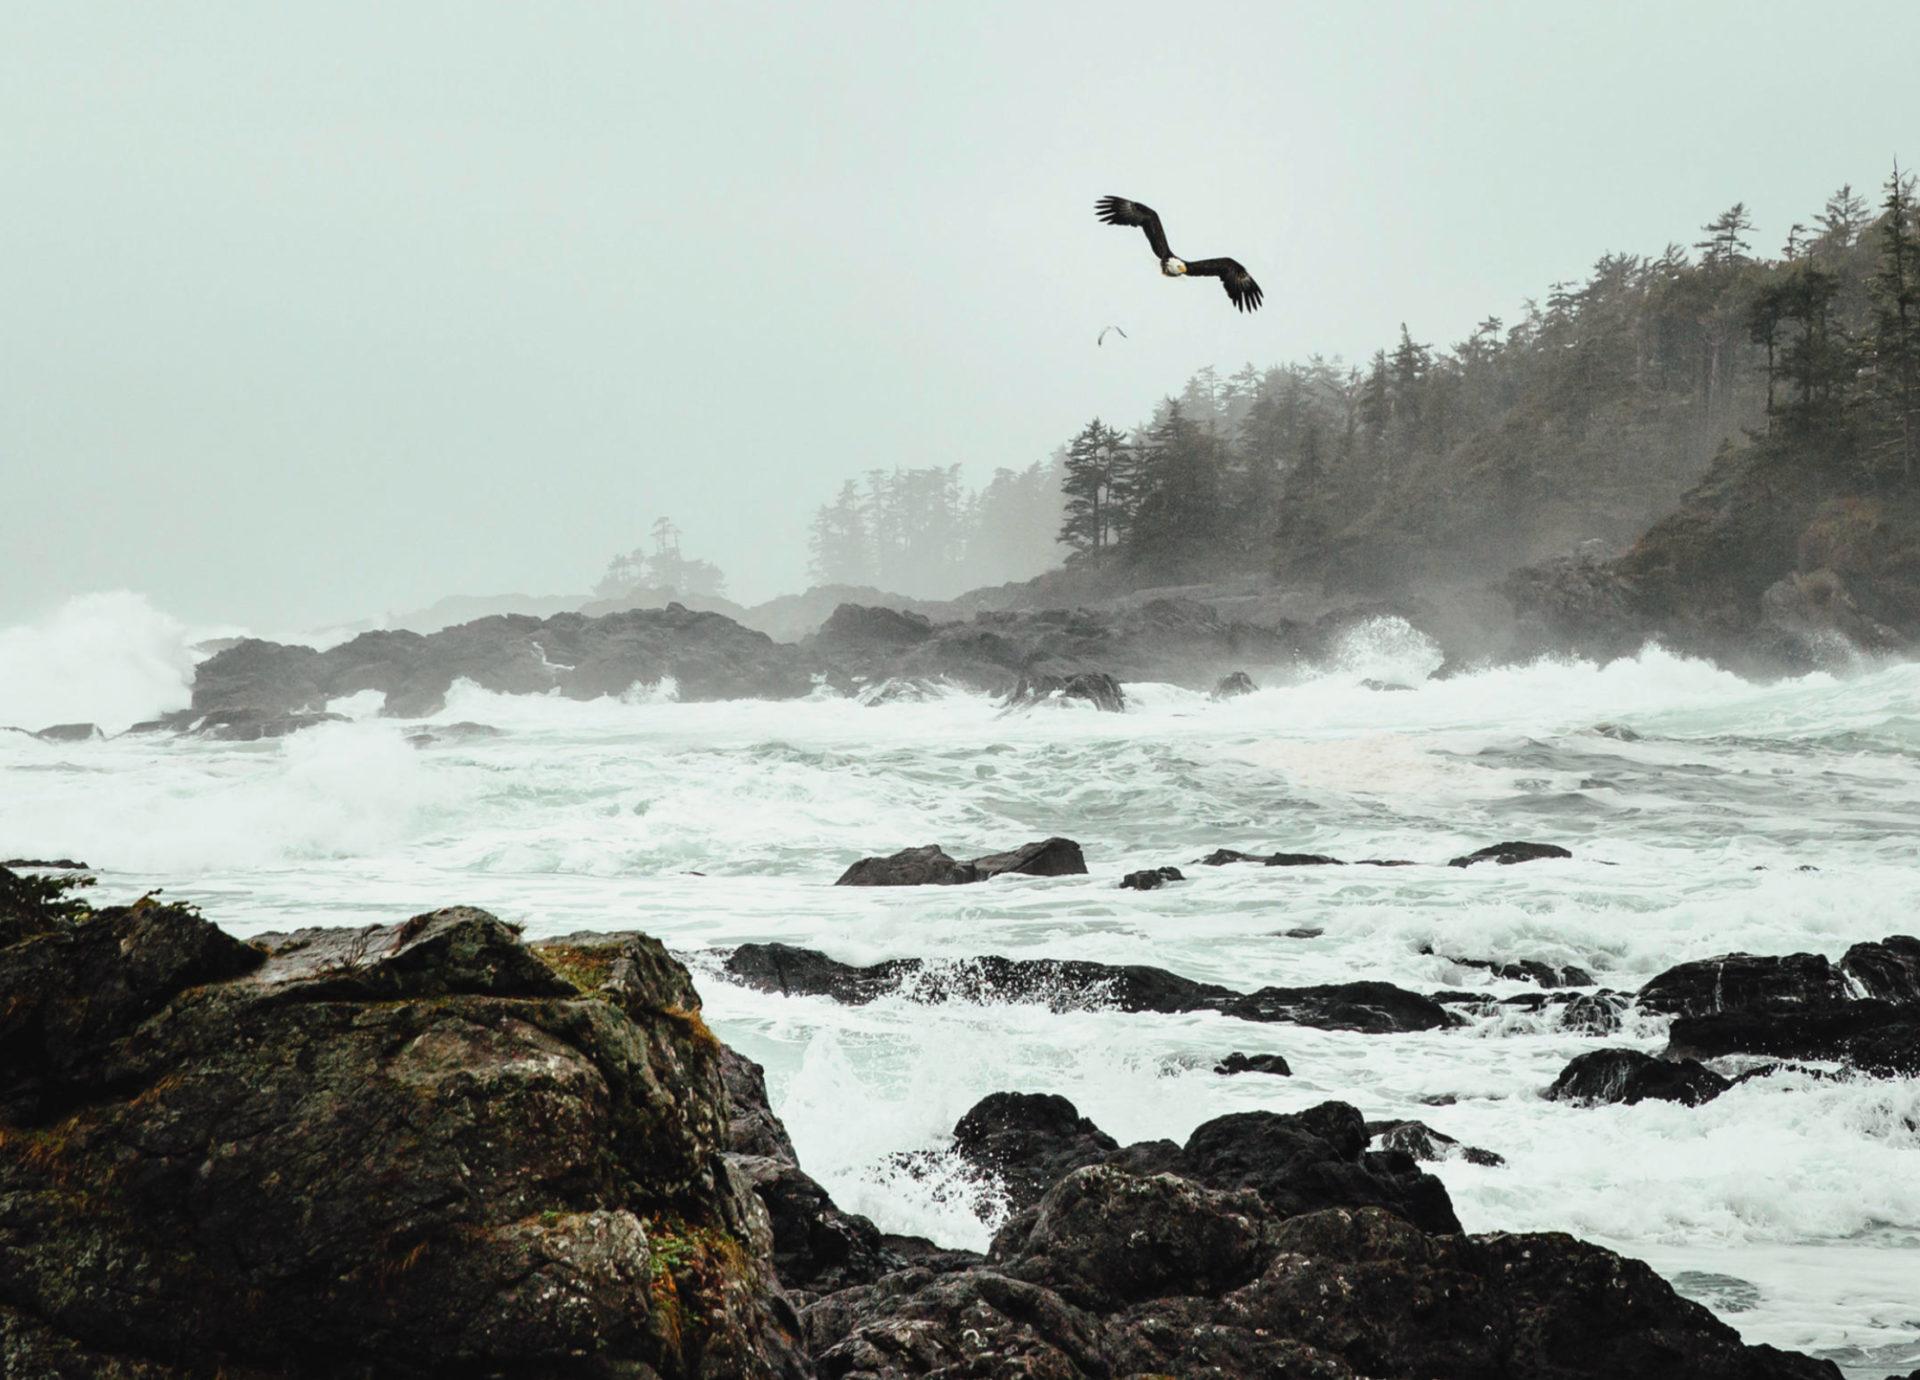 Eagle. Photo by Destination BC/Mike Seehagel.